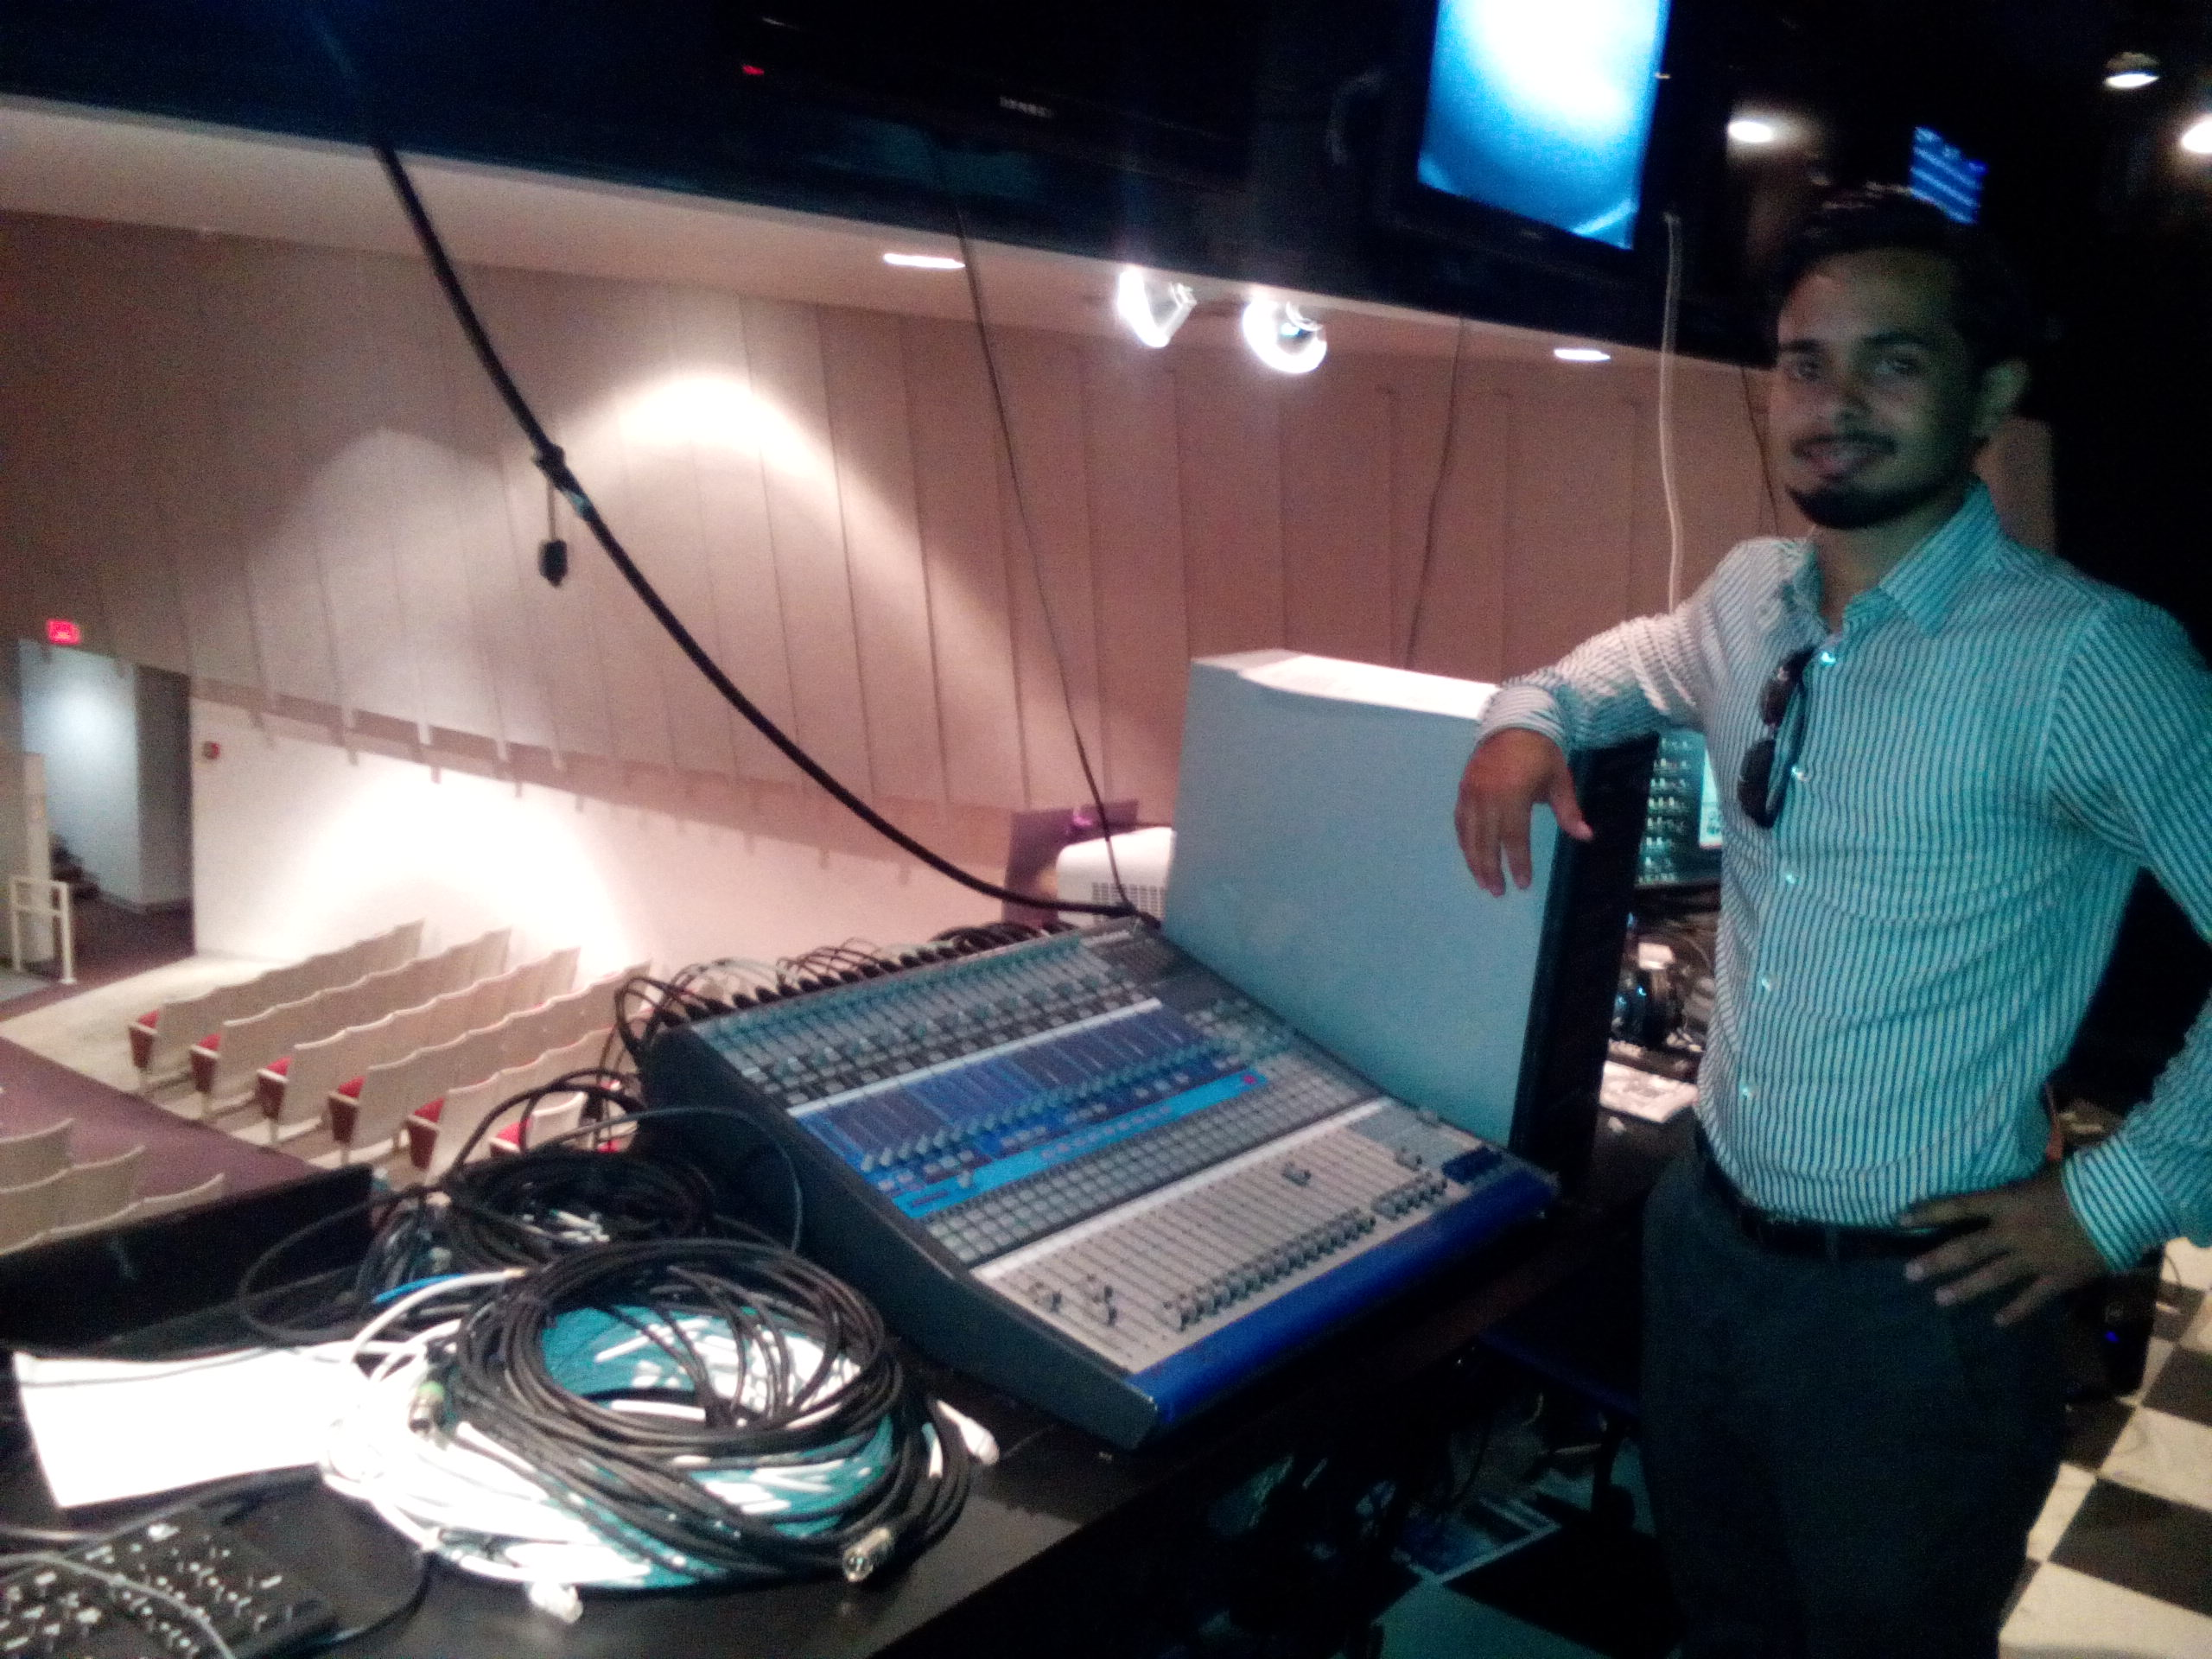 Speakers event control room